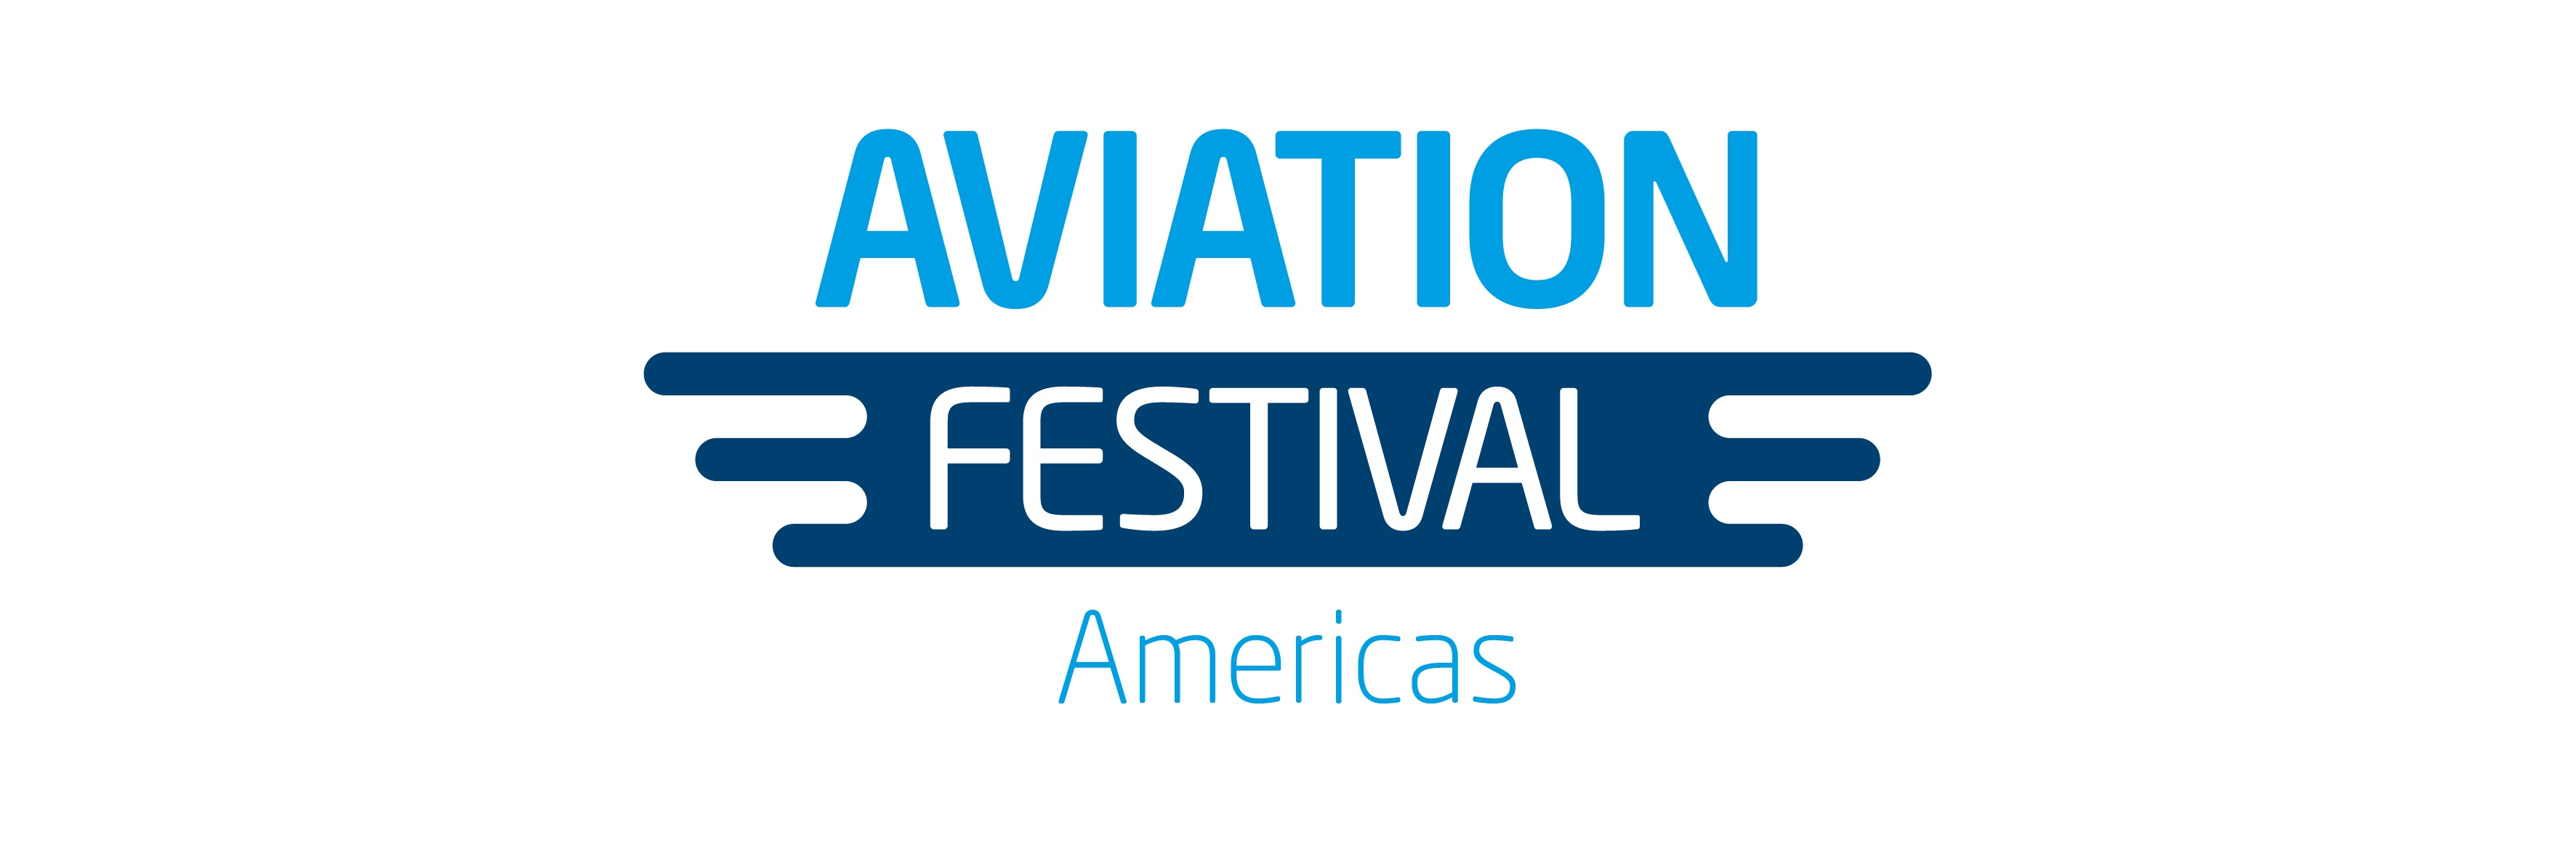 Aviation Festival Americas Logo.jpg